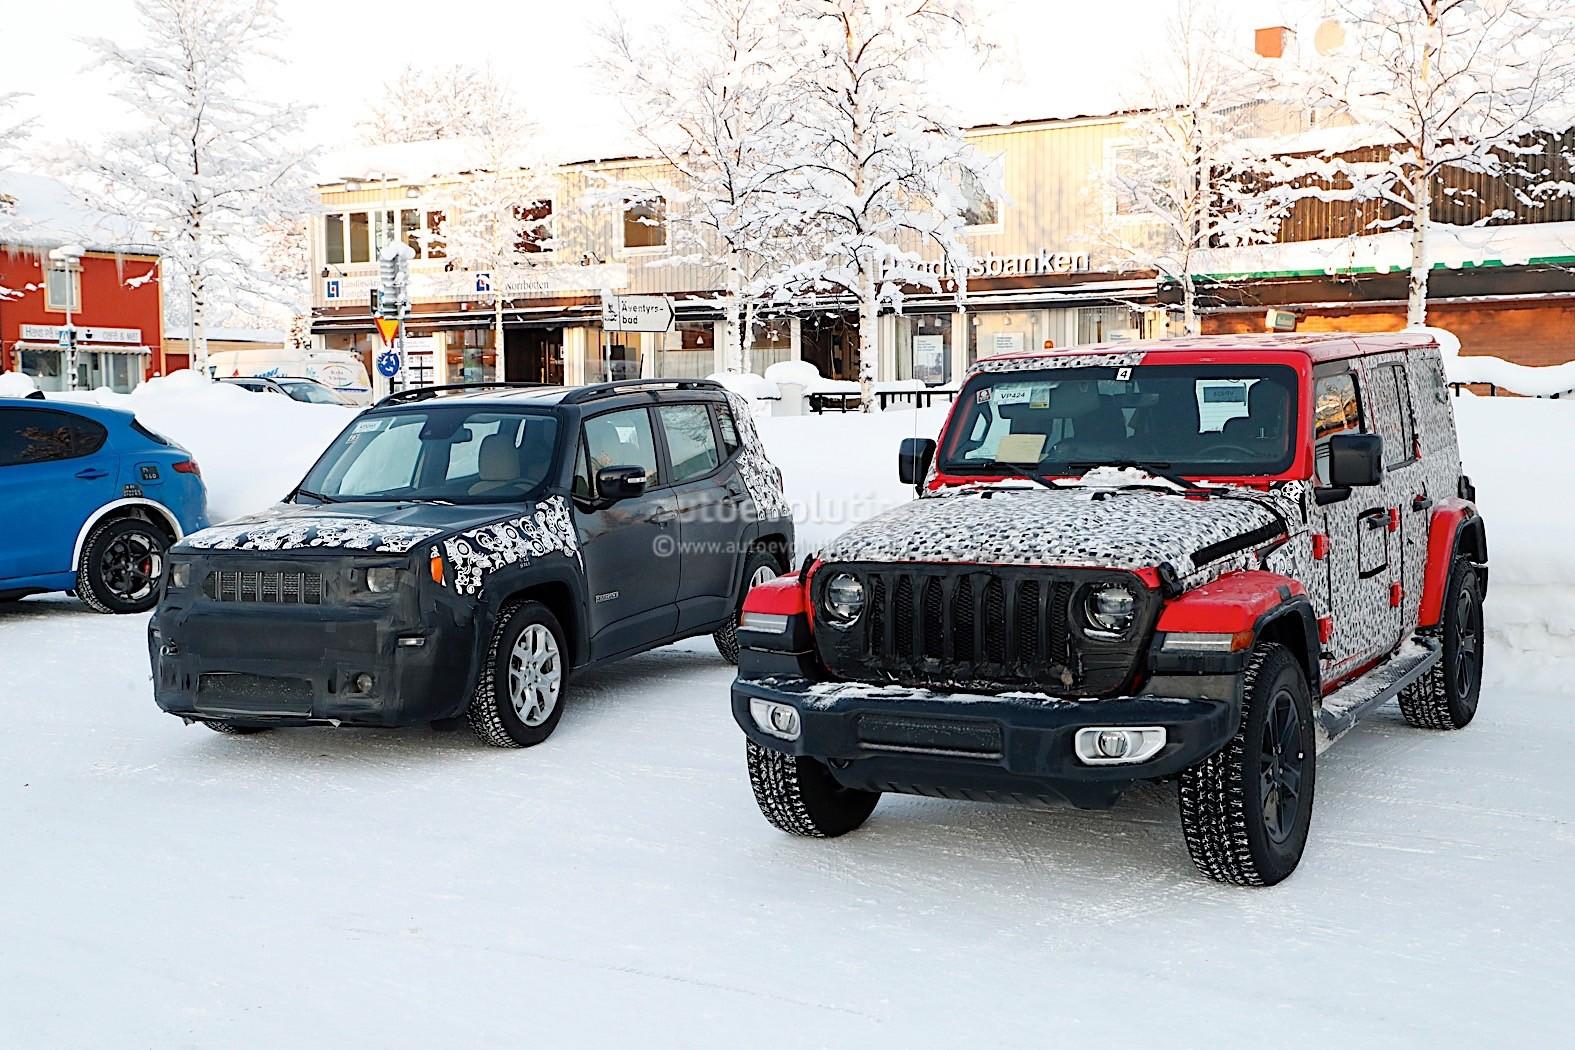 Jeep Renegade Facelift 2018 >> Spyshots: 2019 Jeep Renegade Facelift Gives us Close Ups - autoevolution